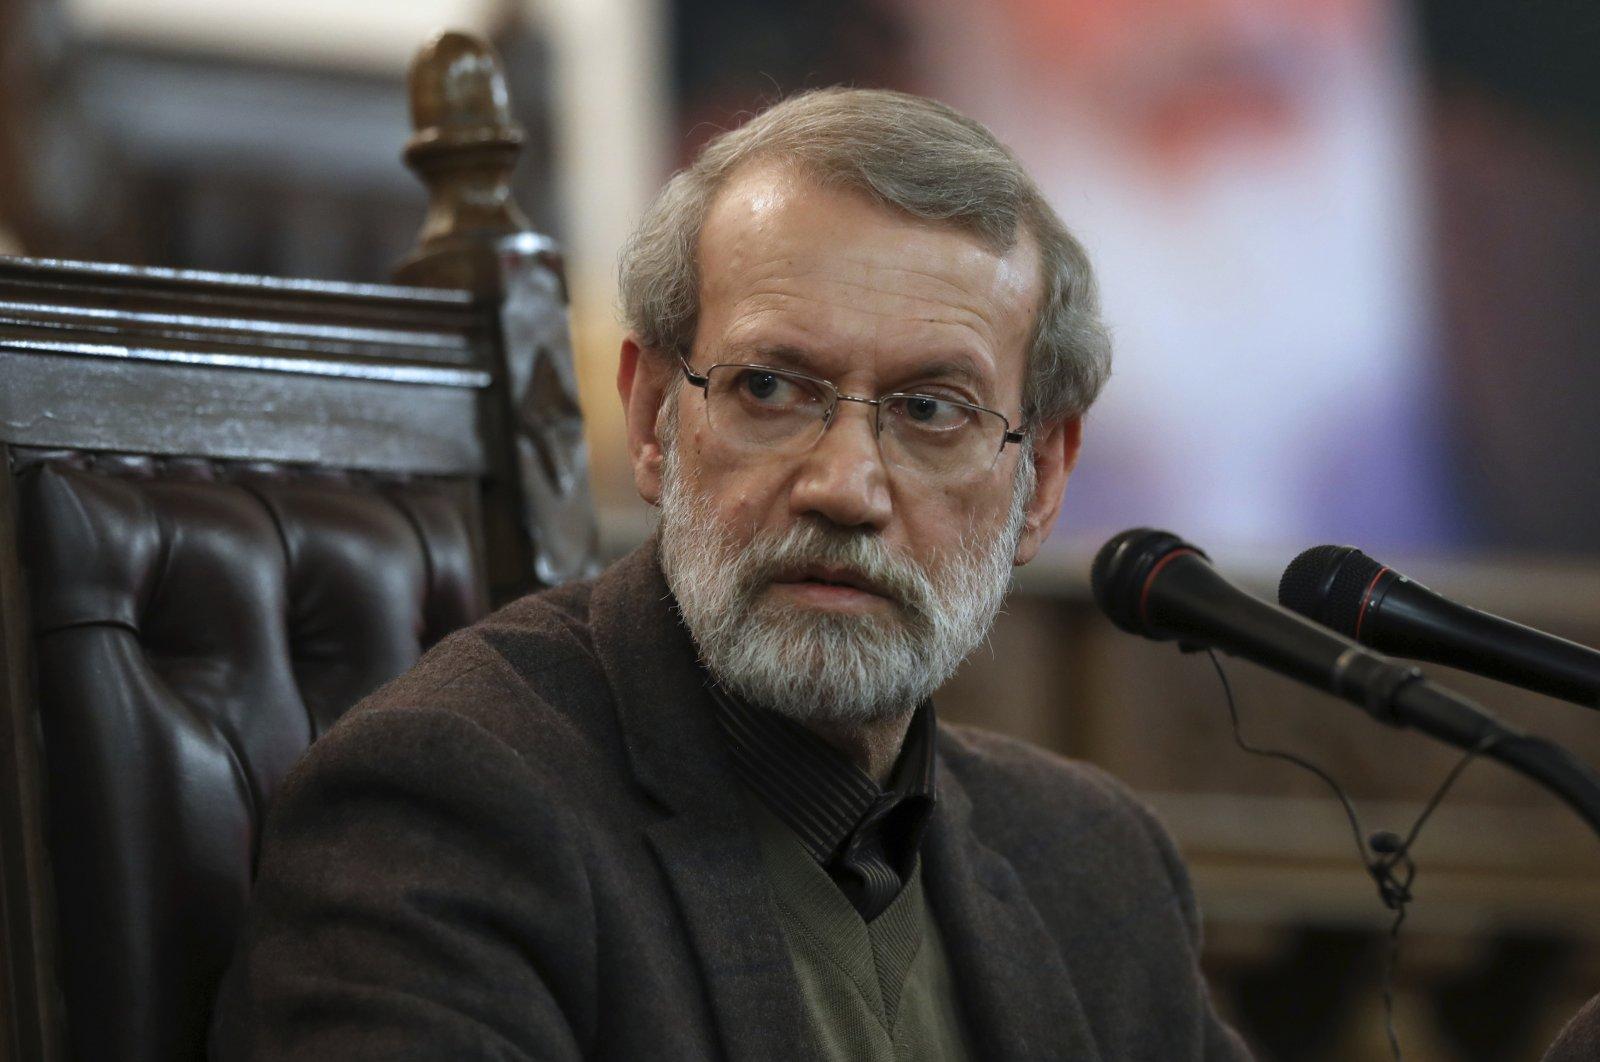 Parliament Speaker Ali Larijani gives a press conference in Tehran, Iran,  Dec. 1, 2019.  (AP Photo)